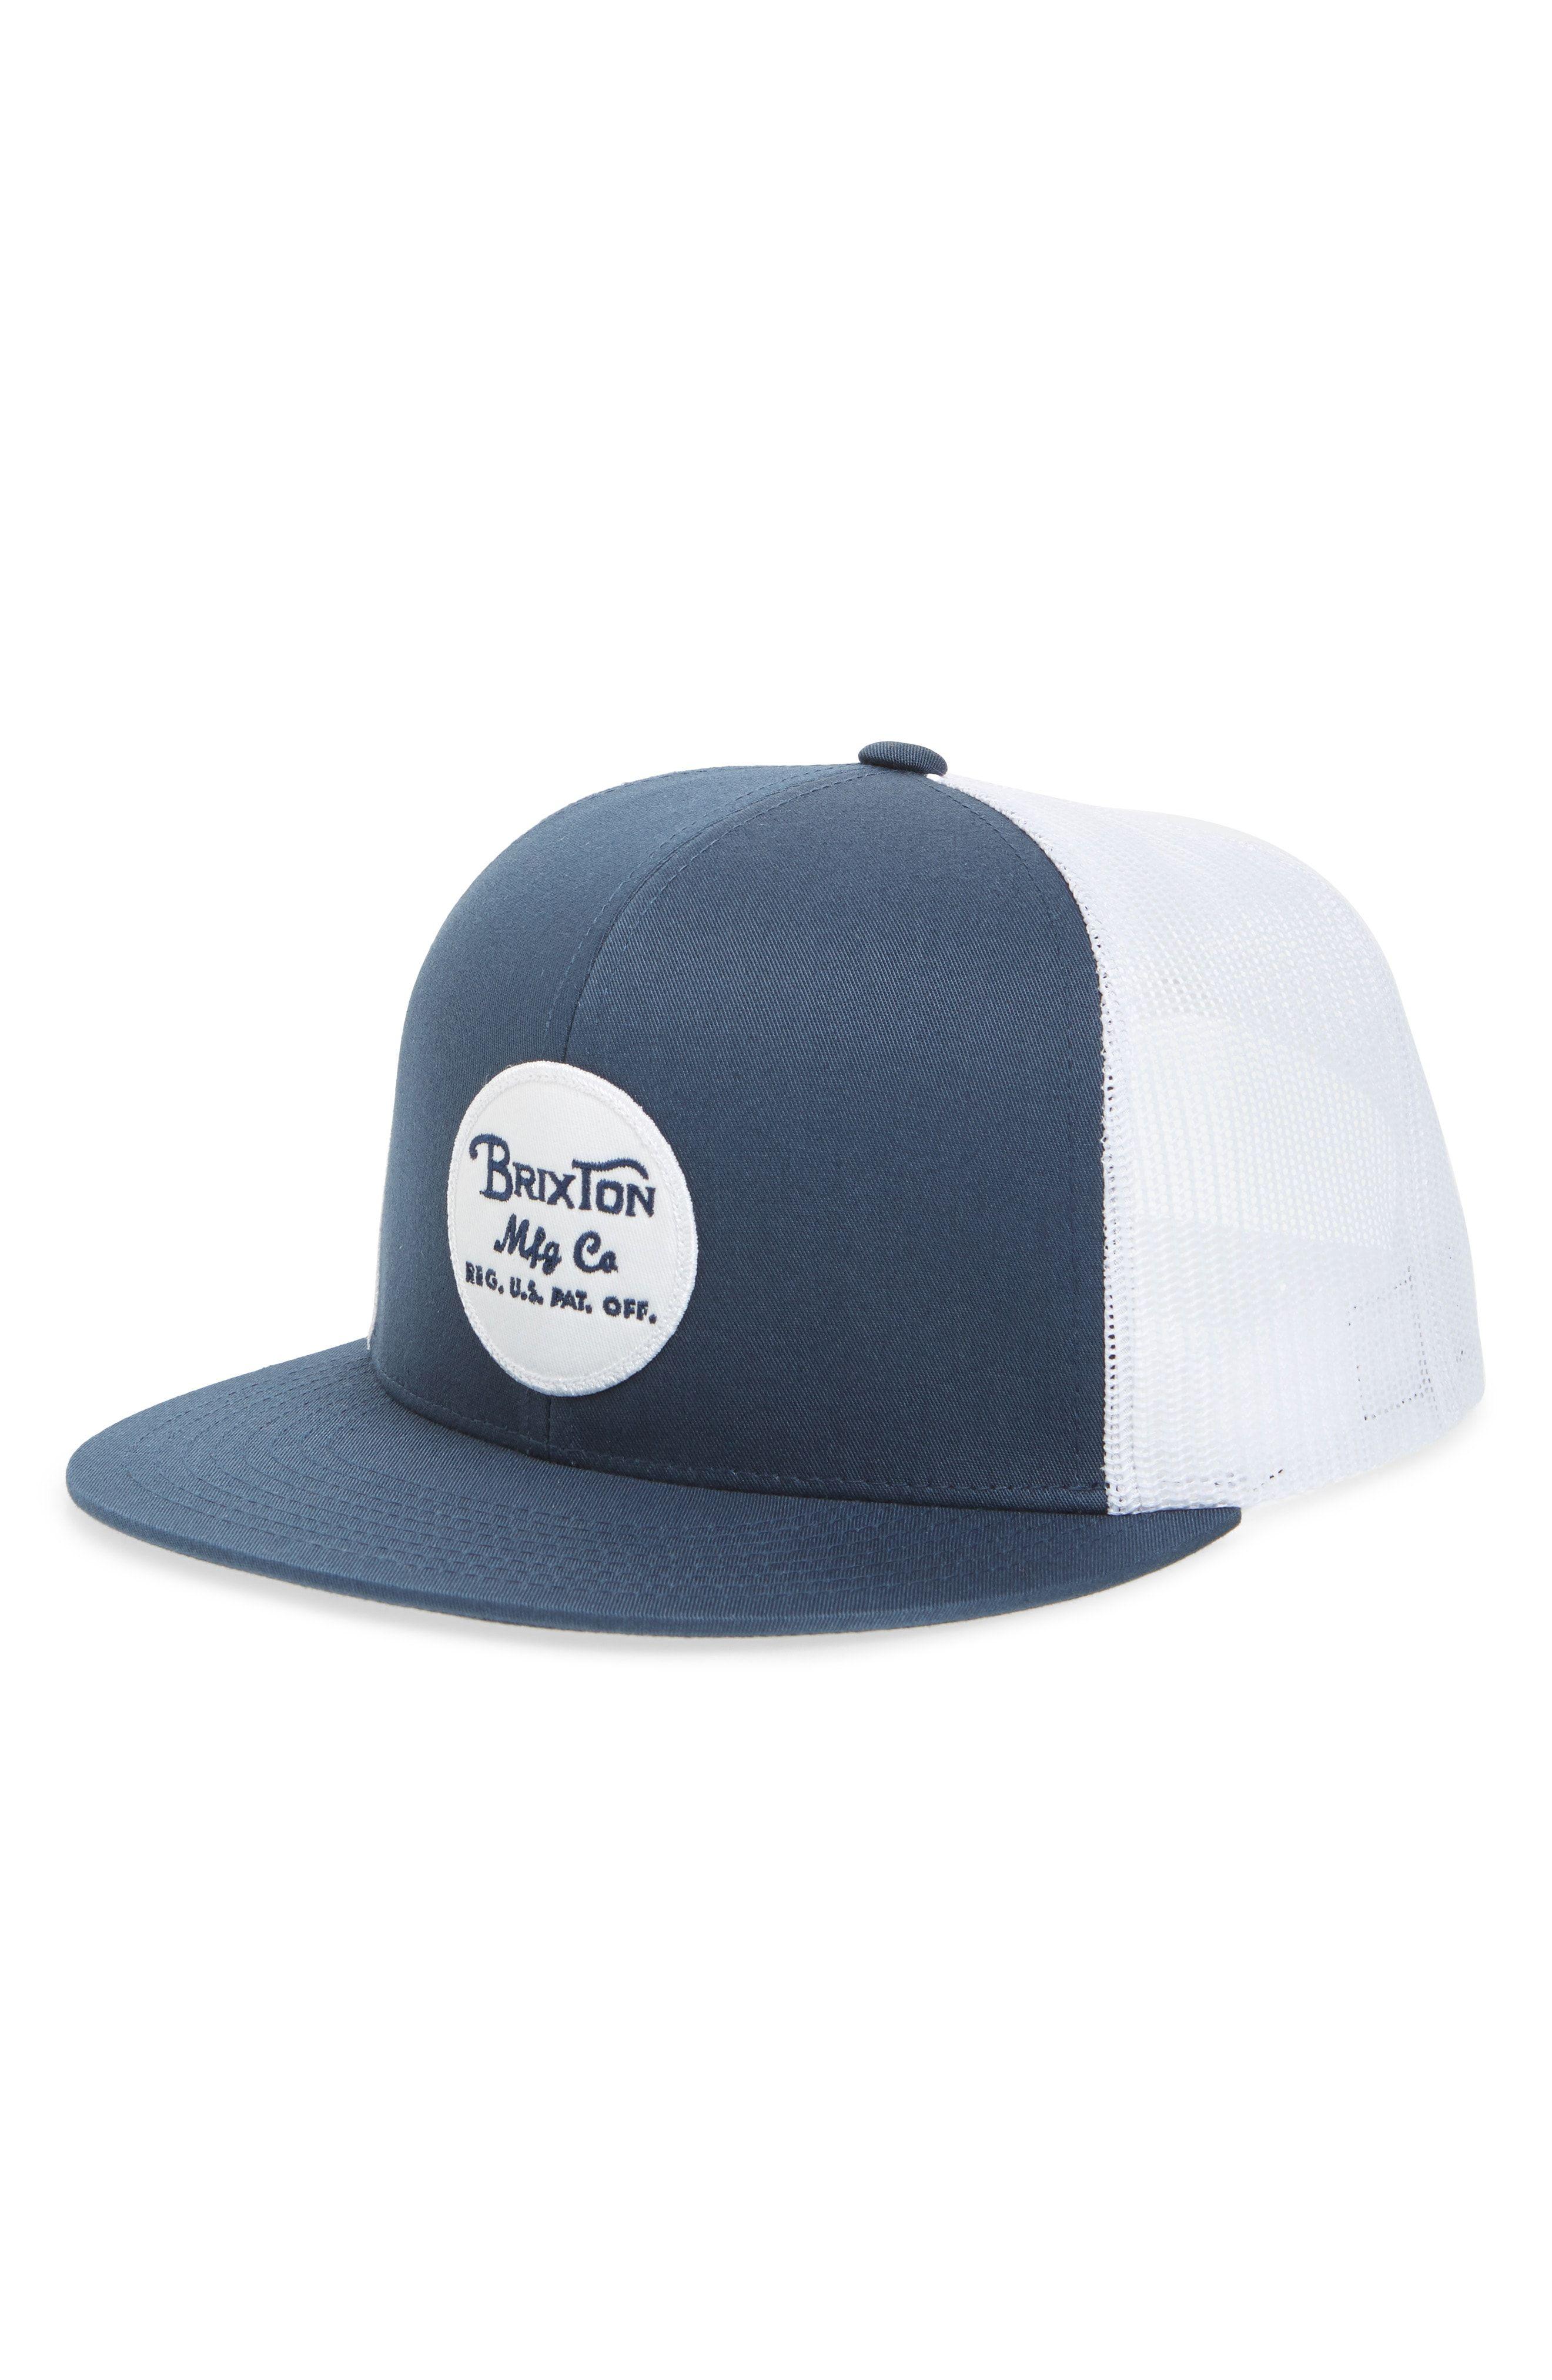 5e6373a3eb963 BRIXTON  BROOD  SNAPBACK CAP - BLUE.  brixton